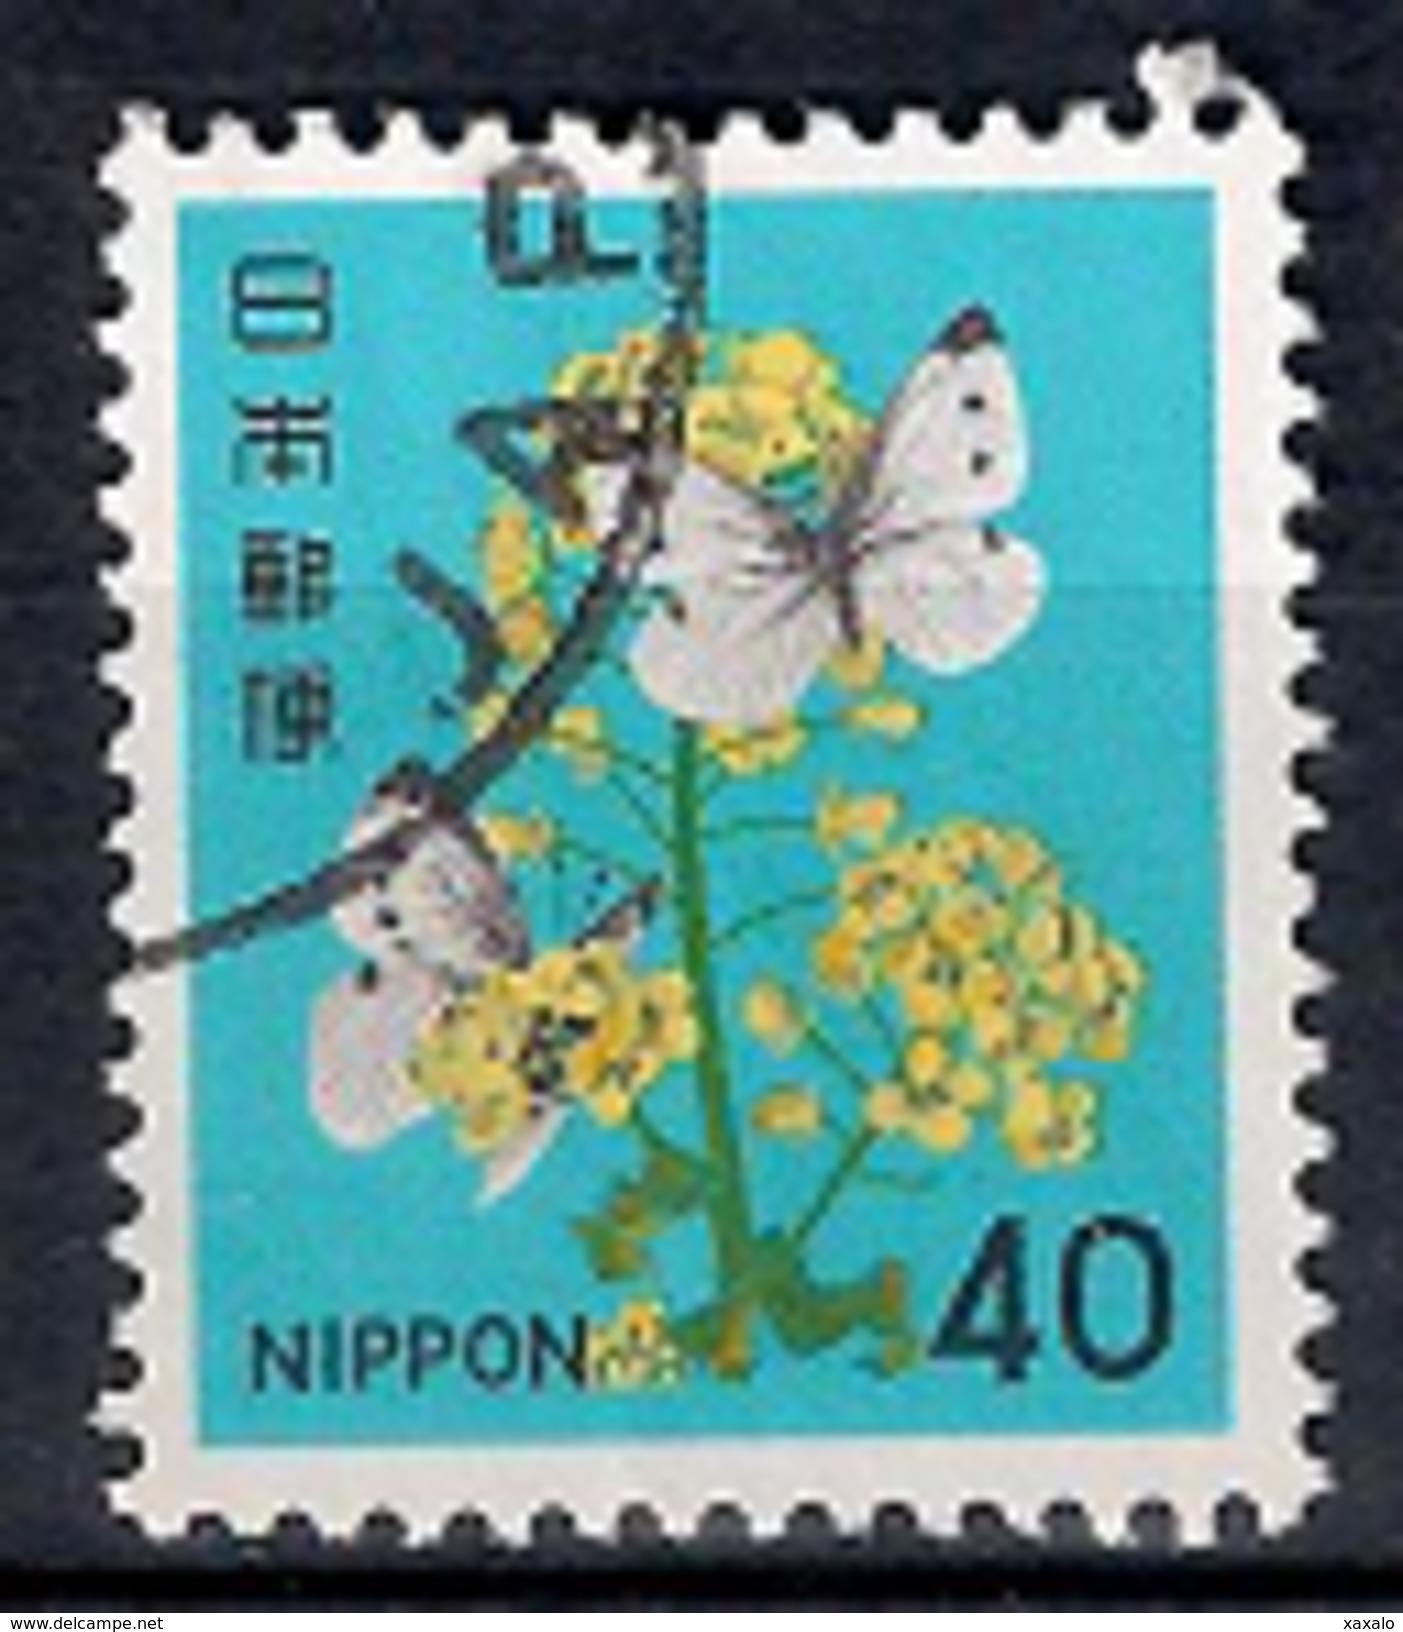 Japan 1980 - Definitive Issue - Flowers - 1926-89 Emperor Hirohito (Showa Era)